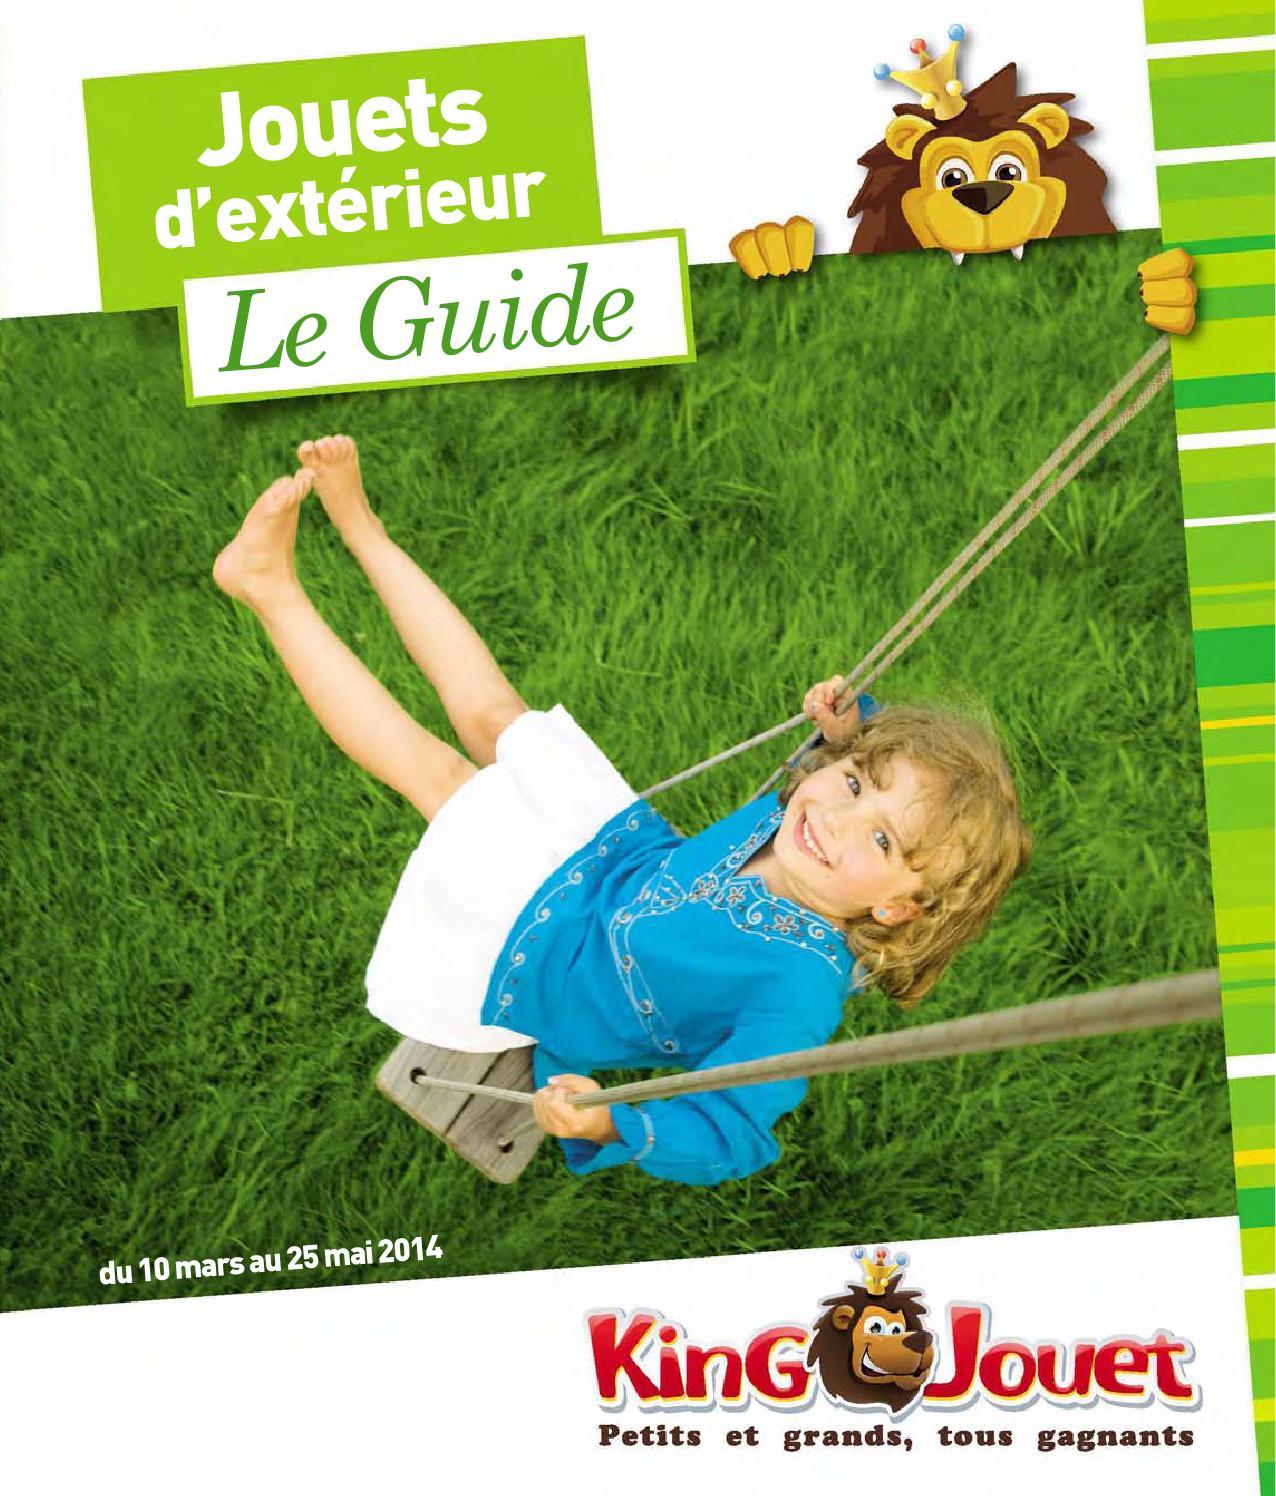 King Mars By Mai Jouet 10 Issuu 25 Anti Du Au 0XPkNnwO8